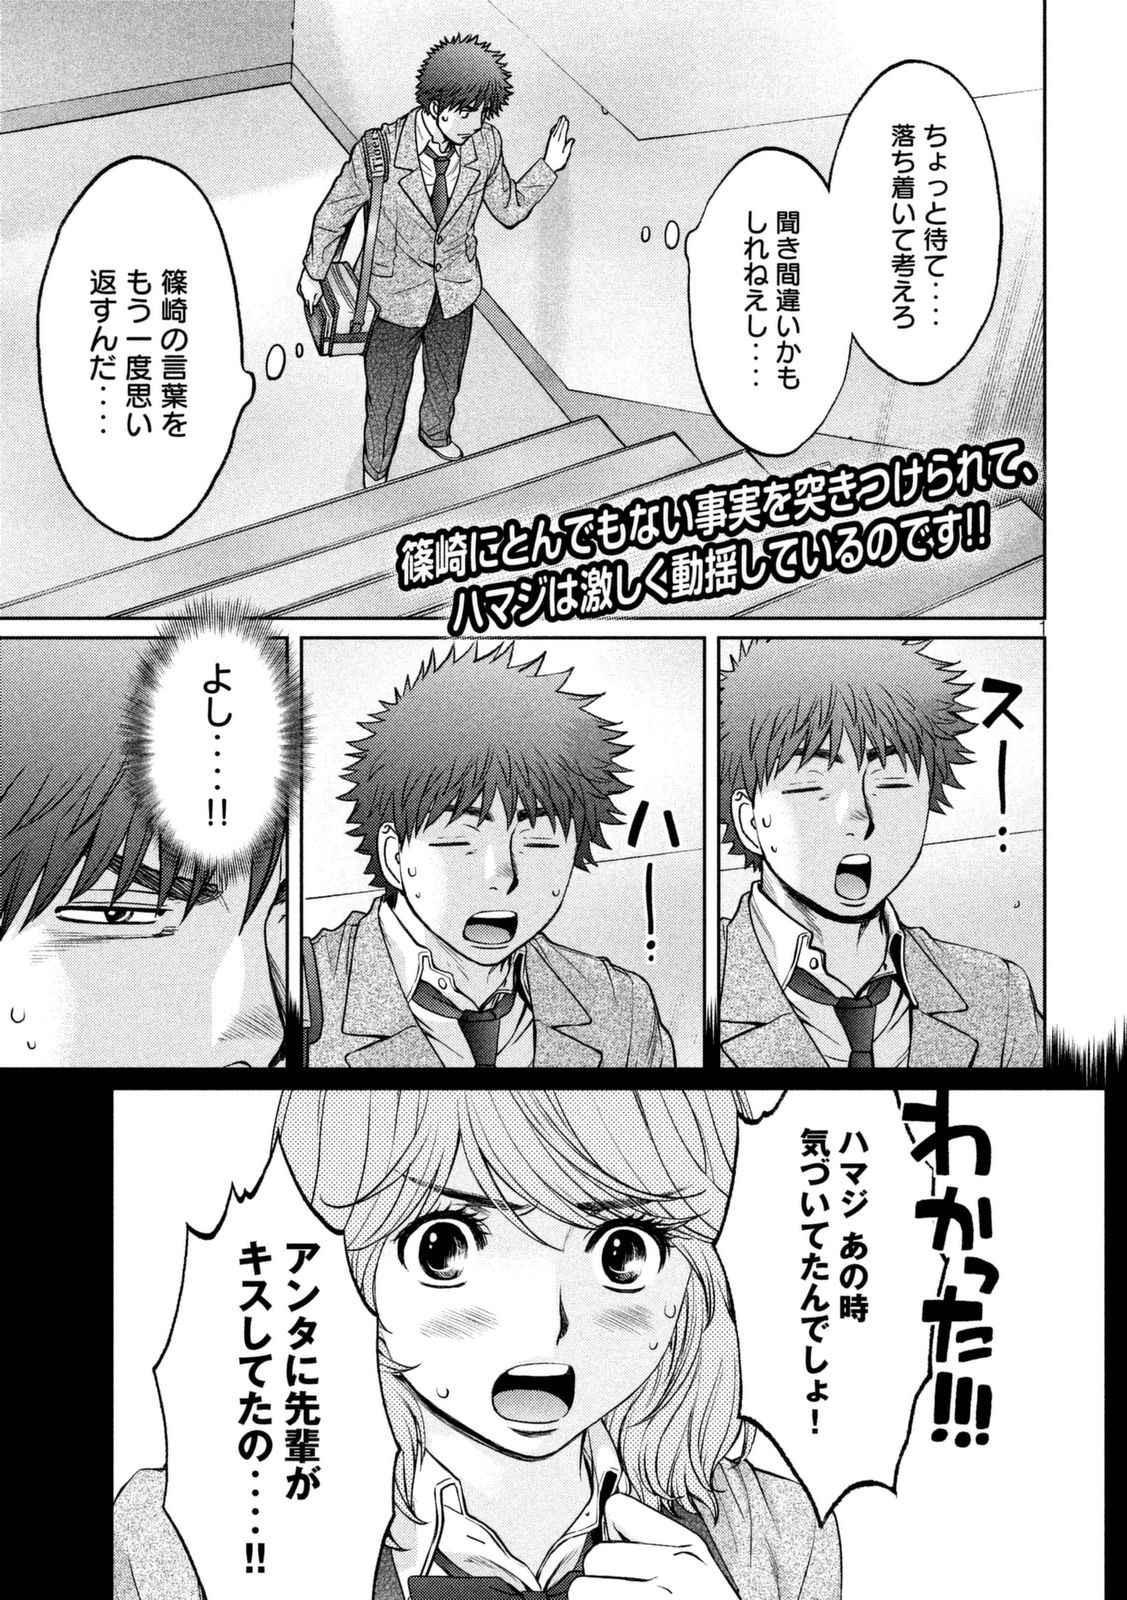 Hantsu x Trash - Chapter 144 - Page 1